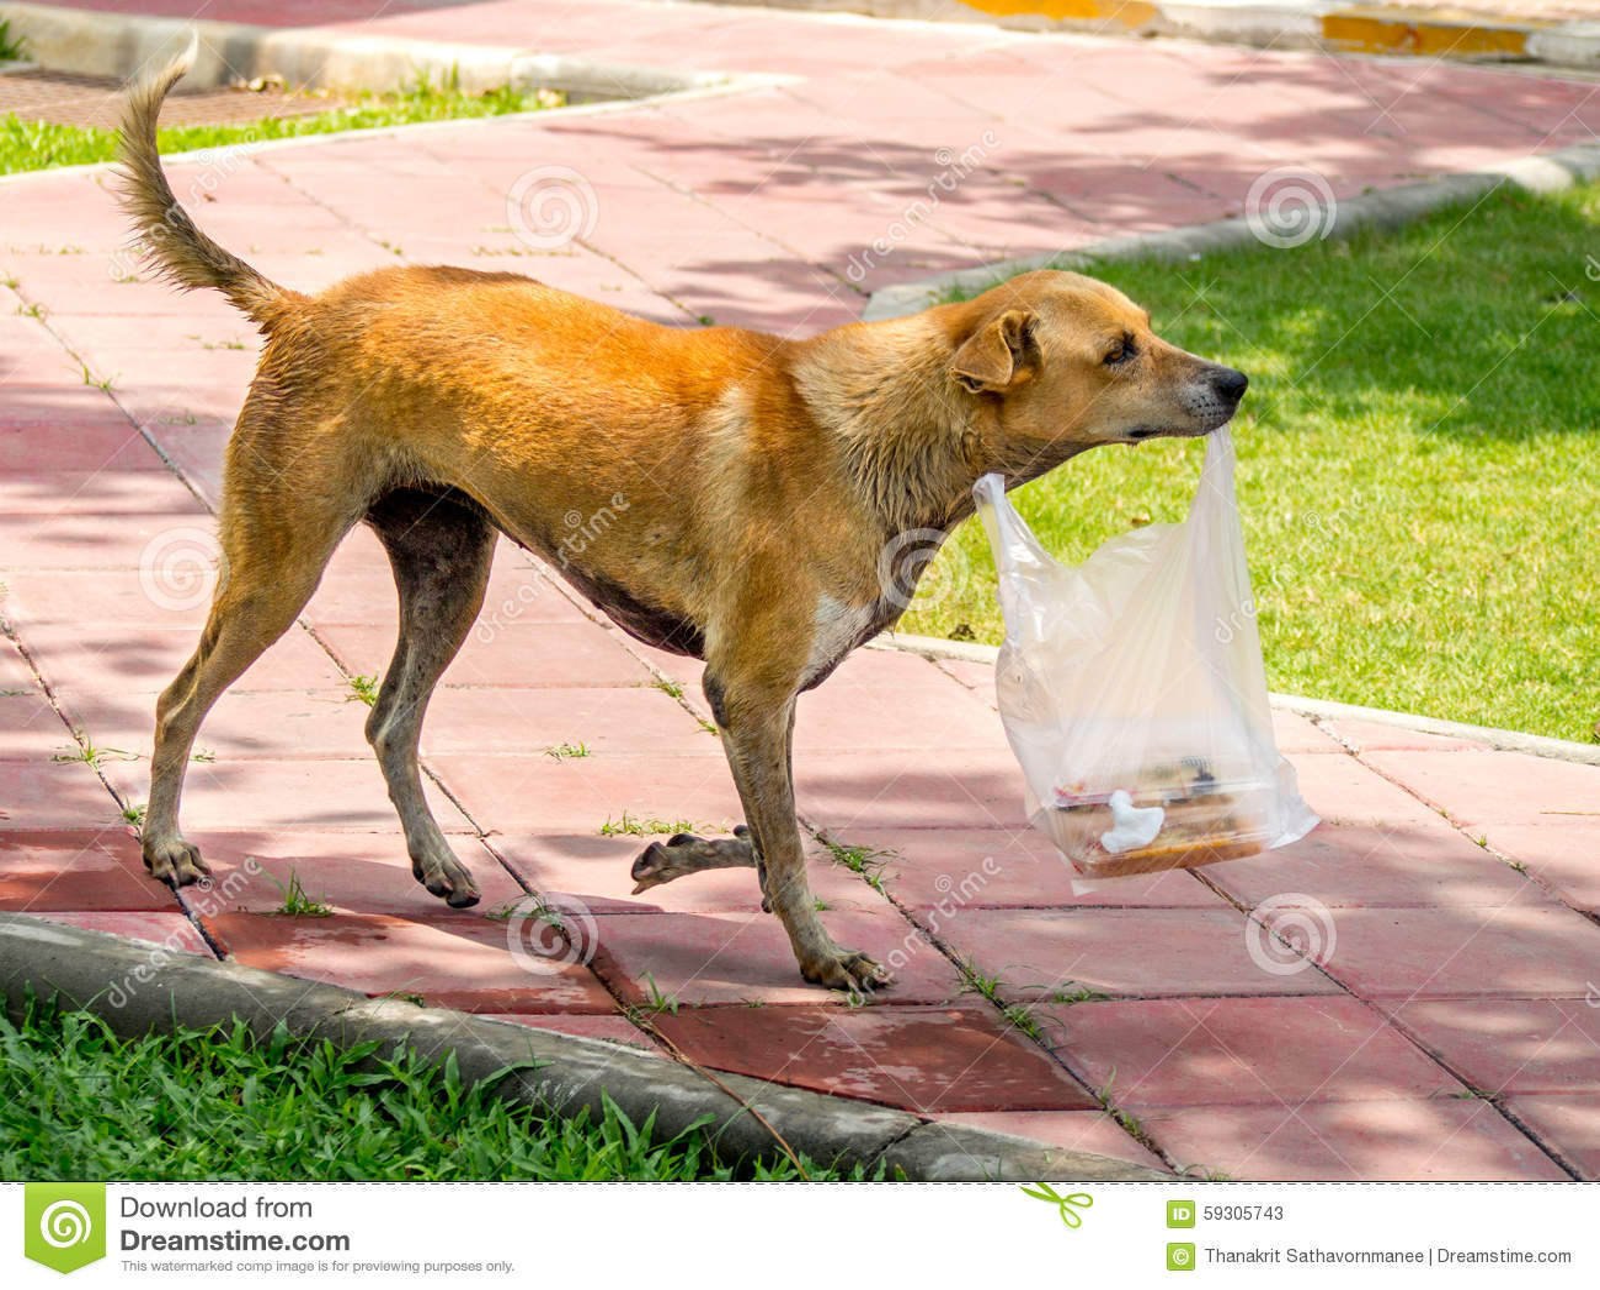 dog carrying bag of food